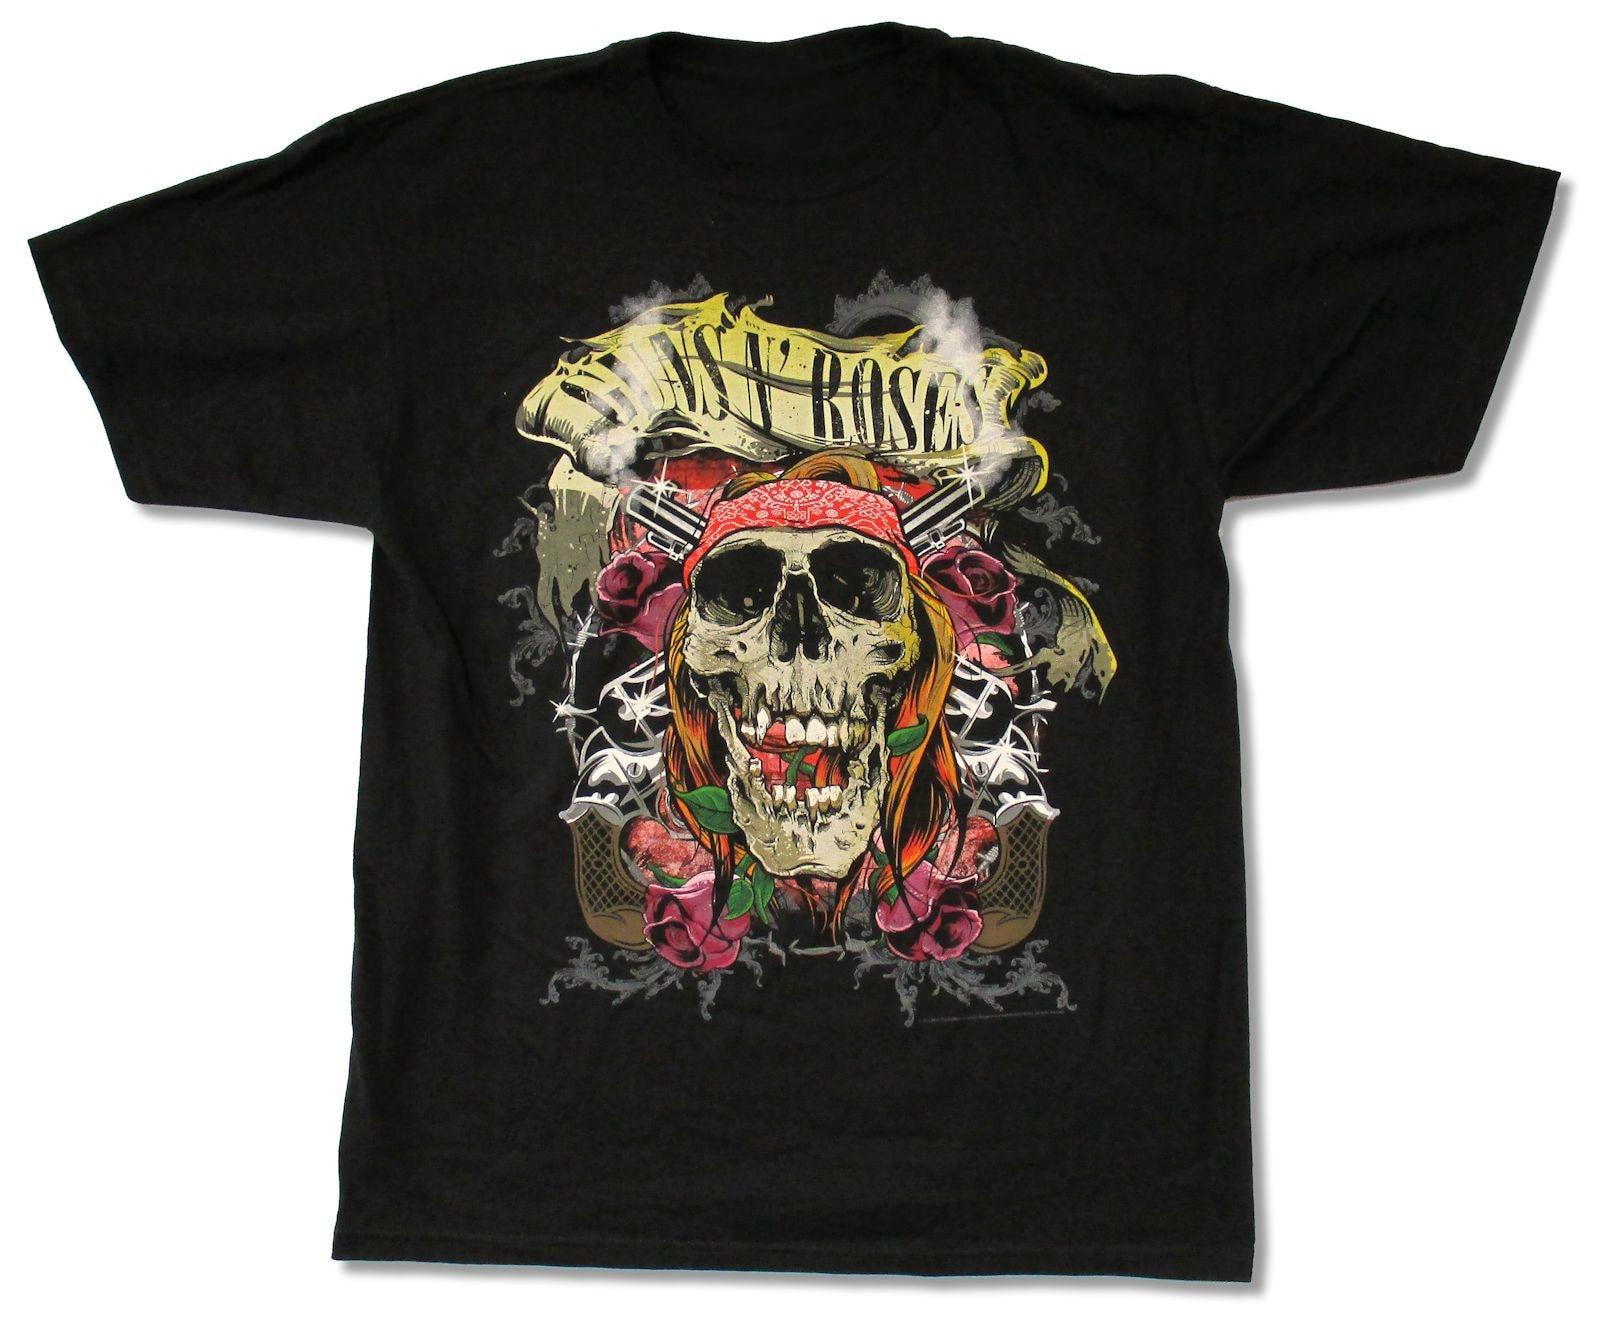 Top O Neck Short Sleeve Guns N Roses Trashy Skull 2013 Tour Black T Shirt New Official Adult New Mens T Shirt Brands